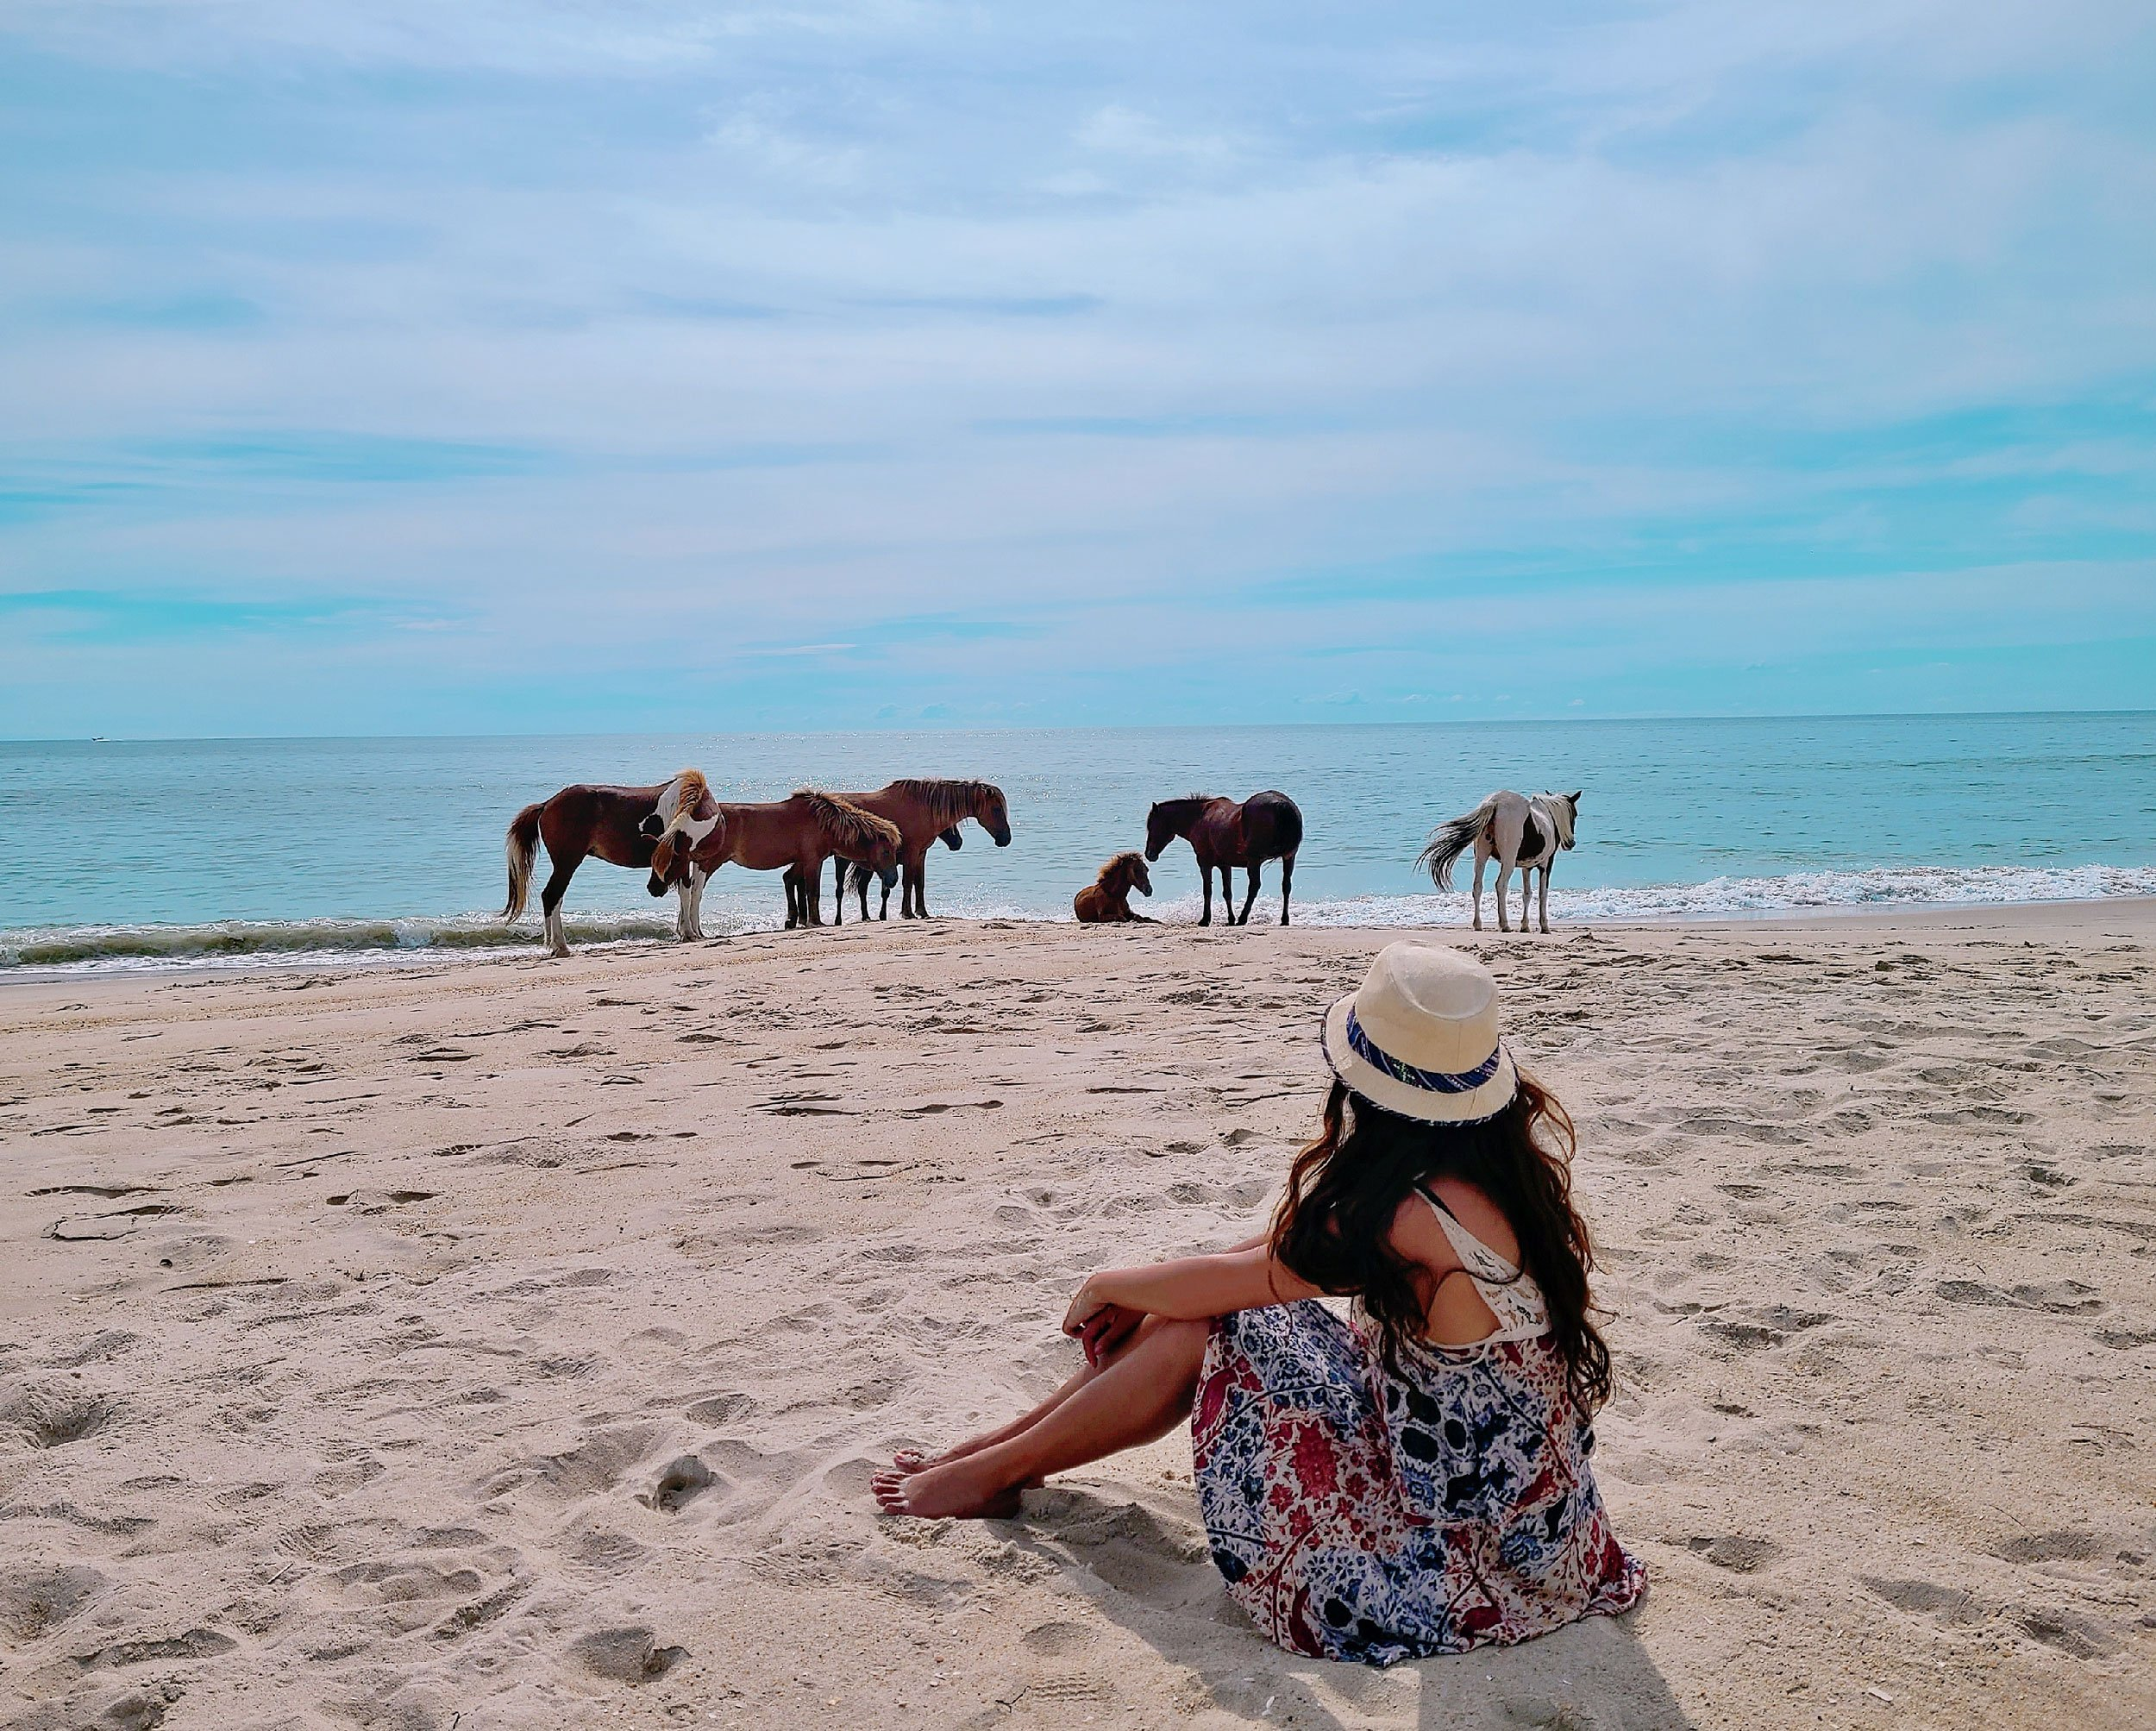 Wild ponies on Chincoteague Island Virginia | 2 Week Virginia Road Trip from Washington DC